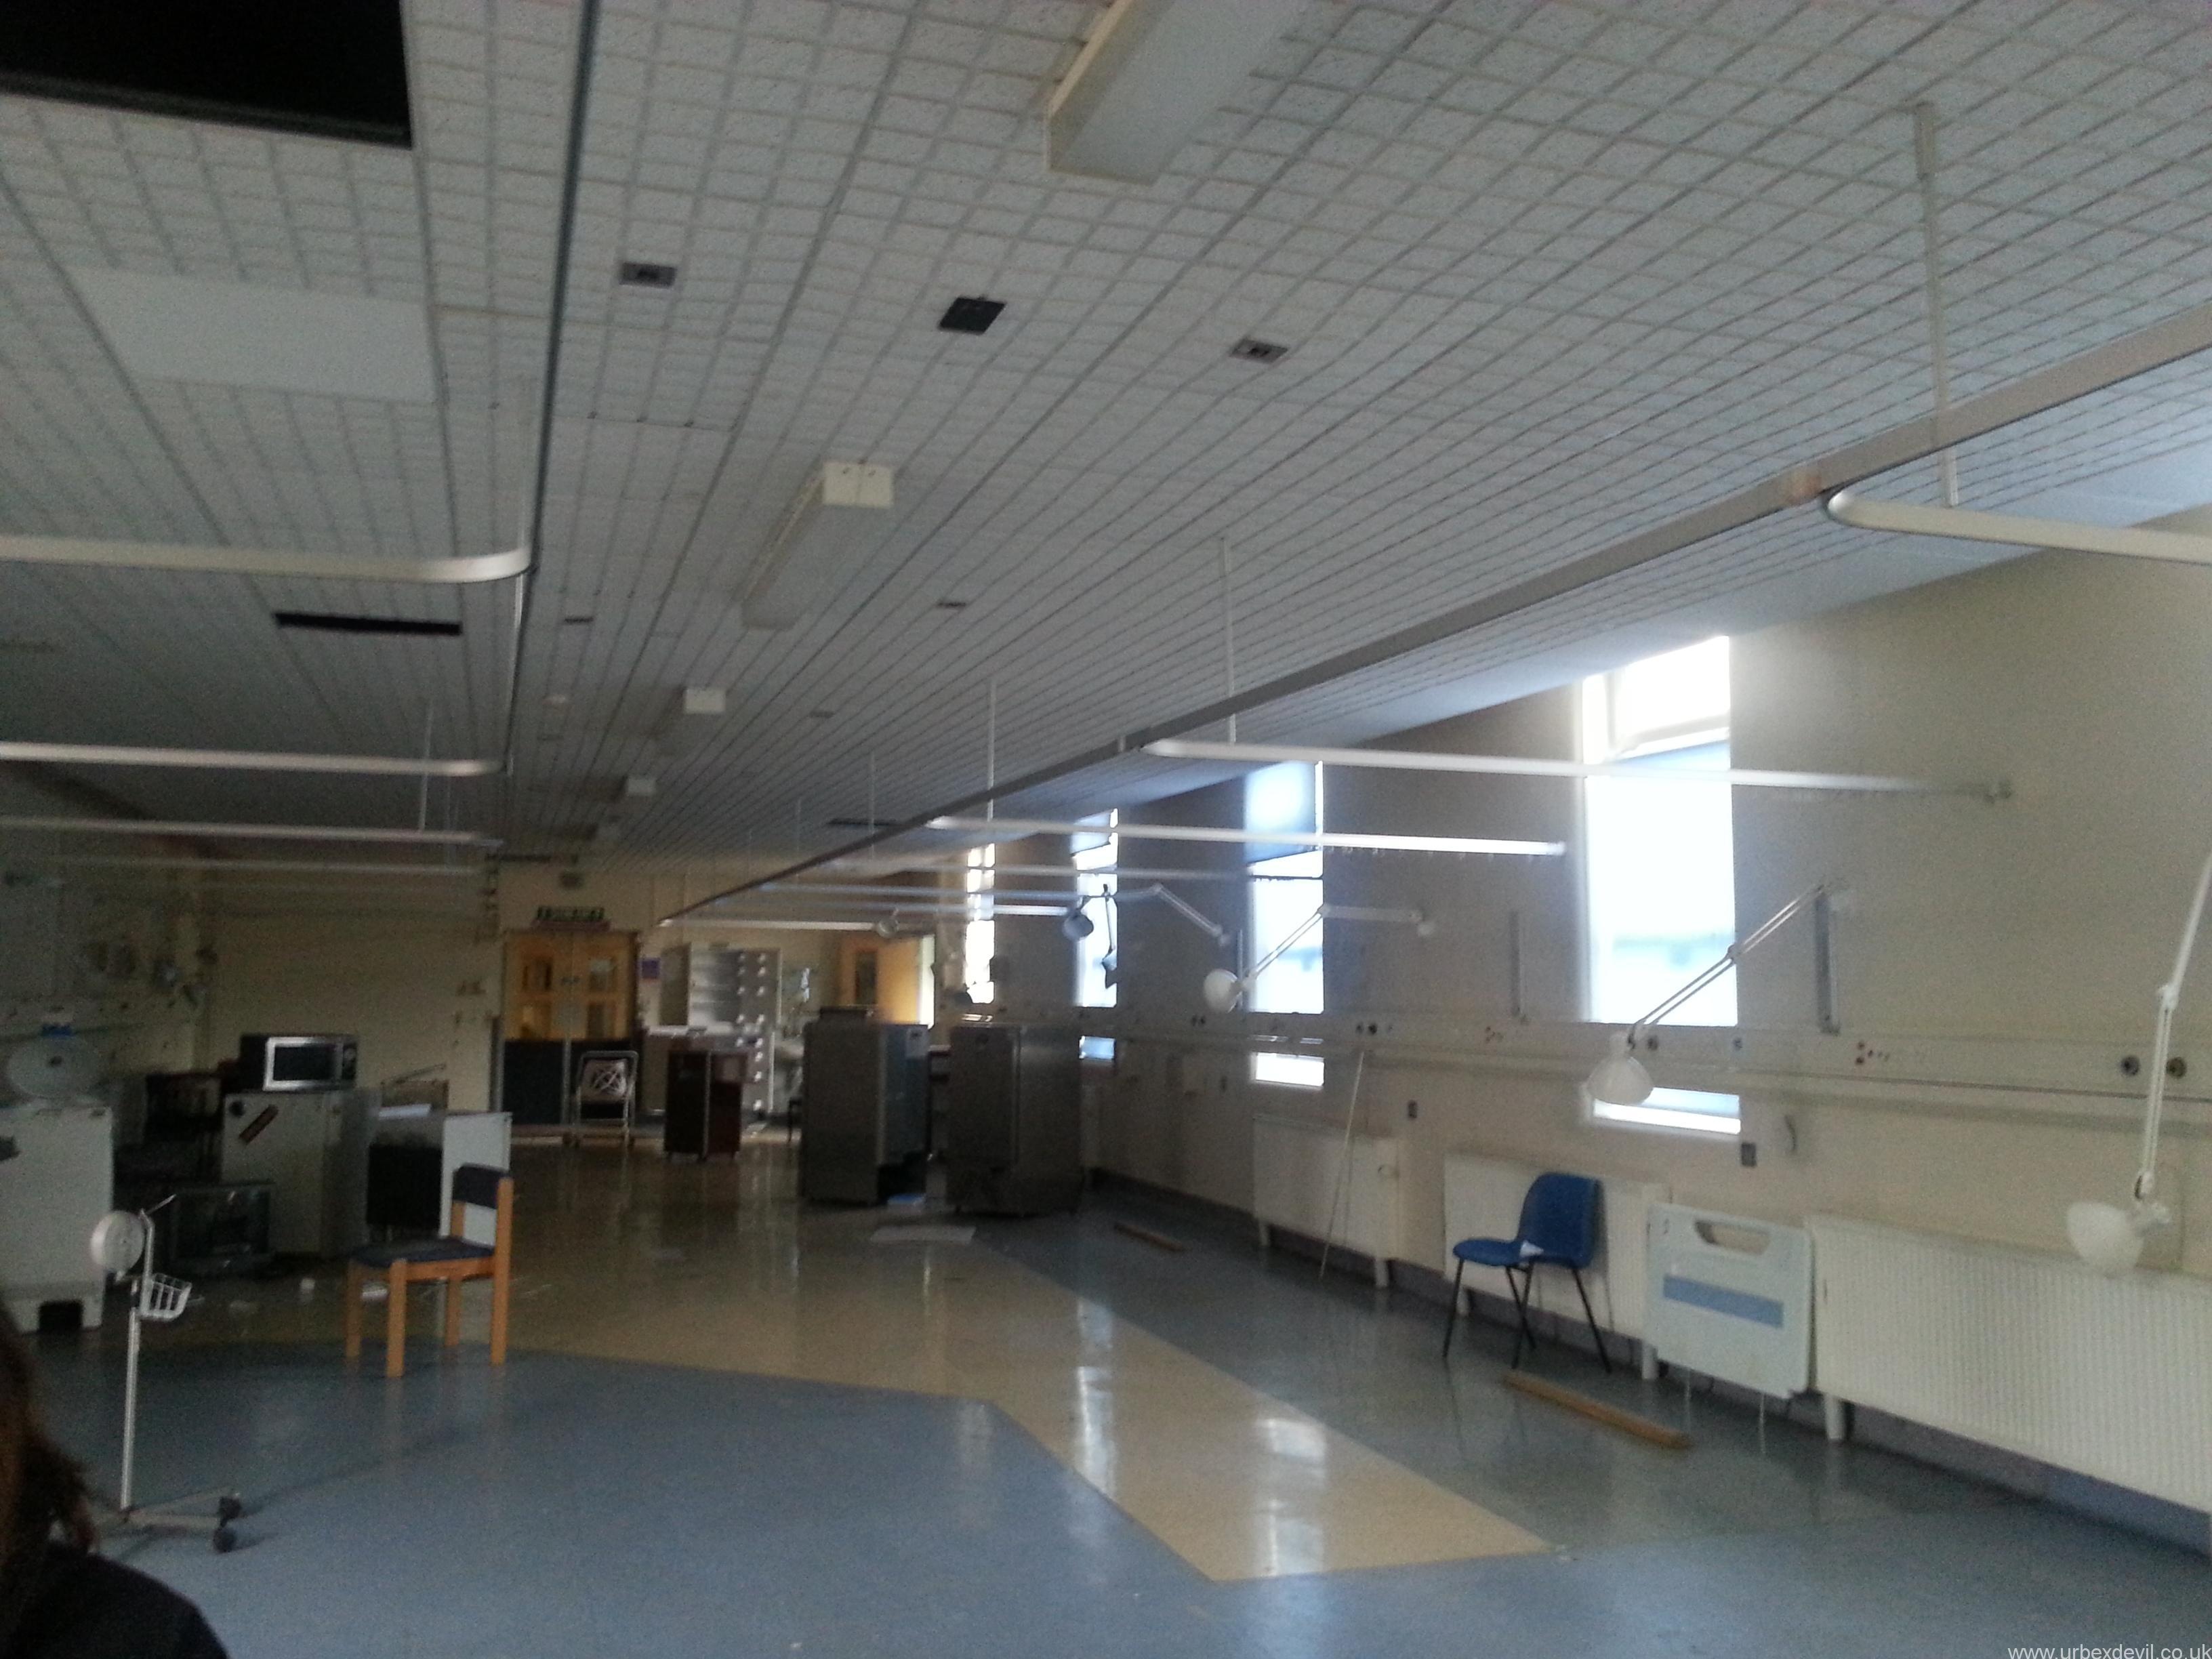 Selly Oak Hospital